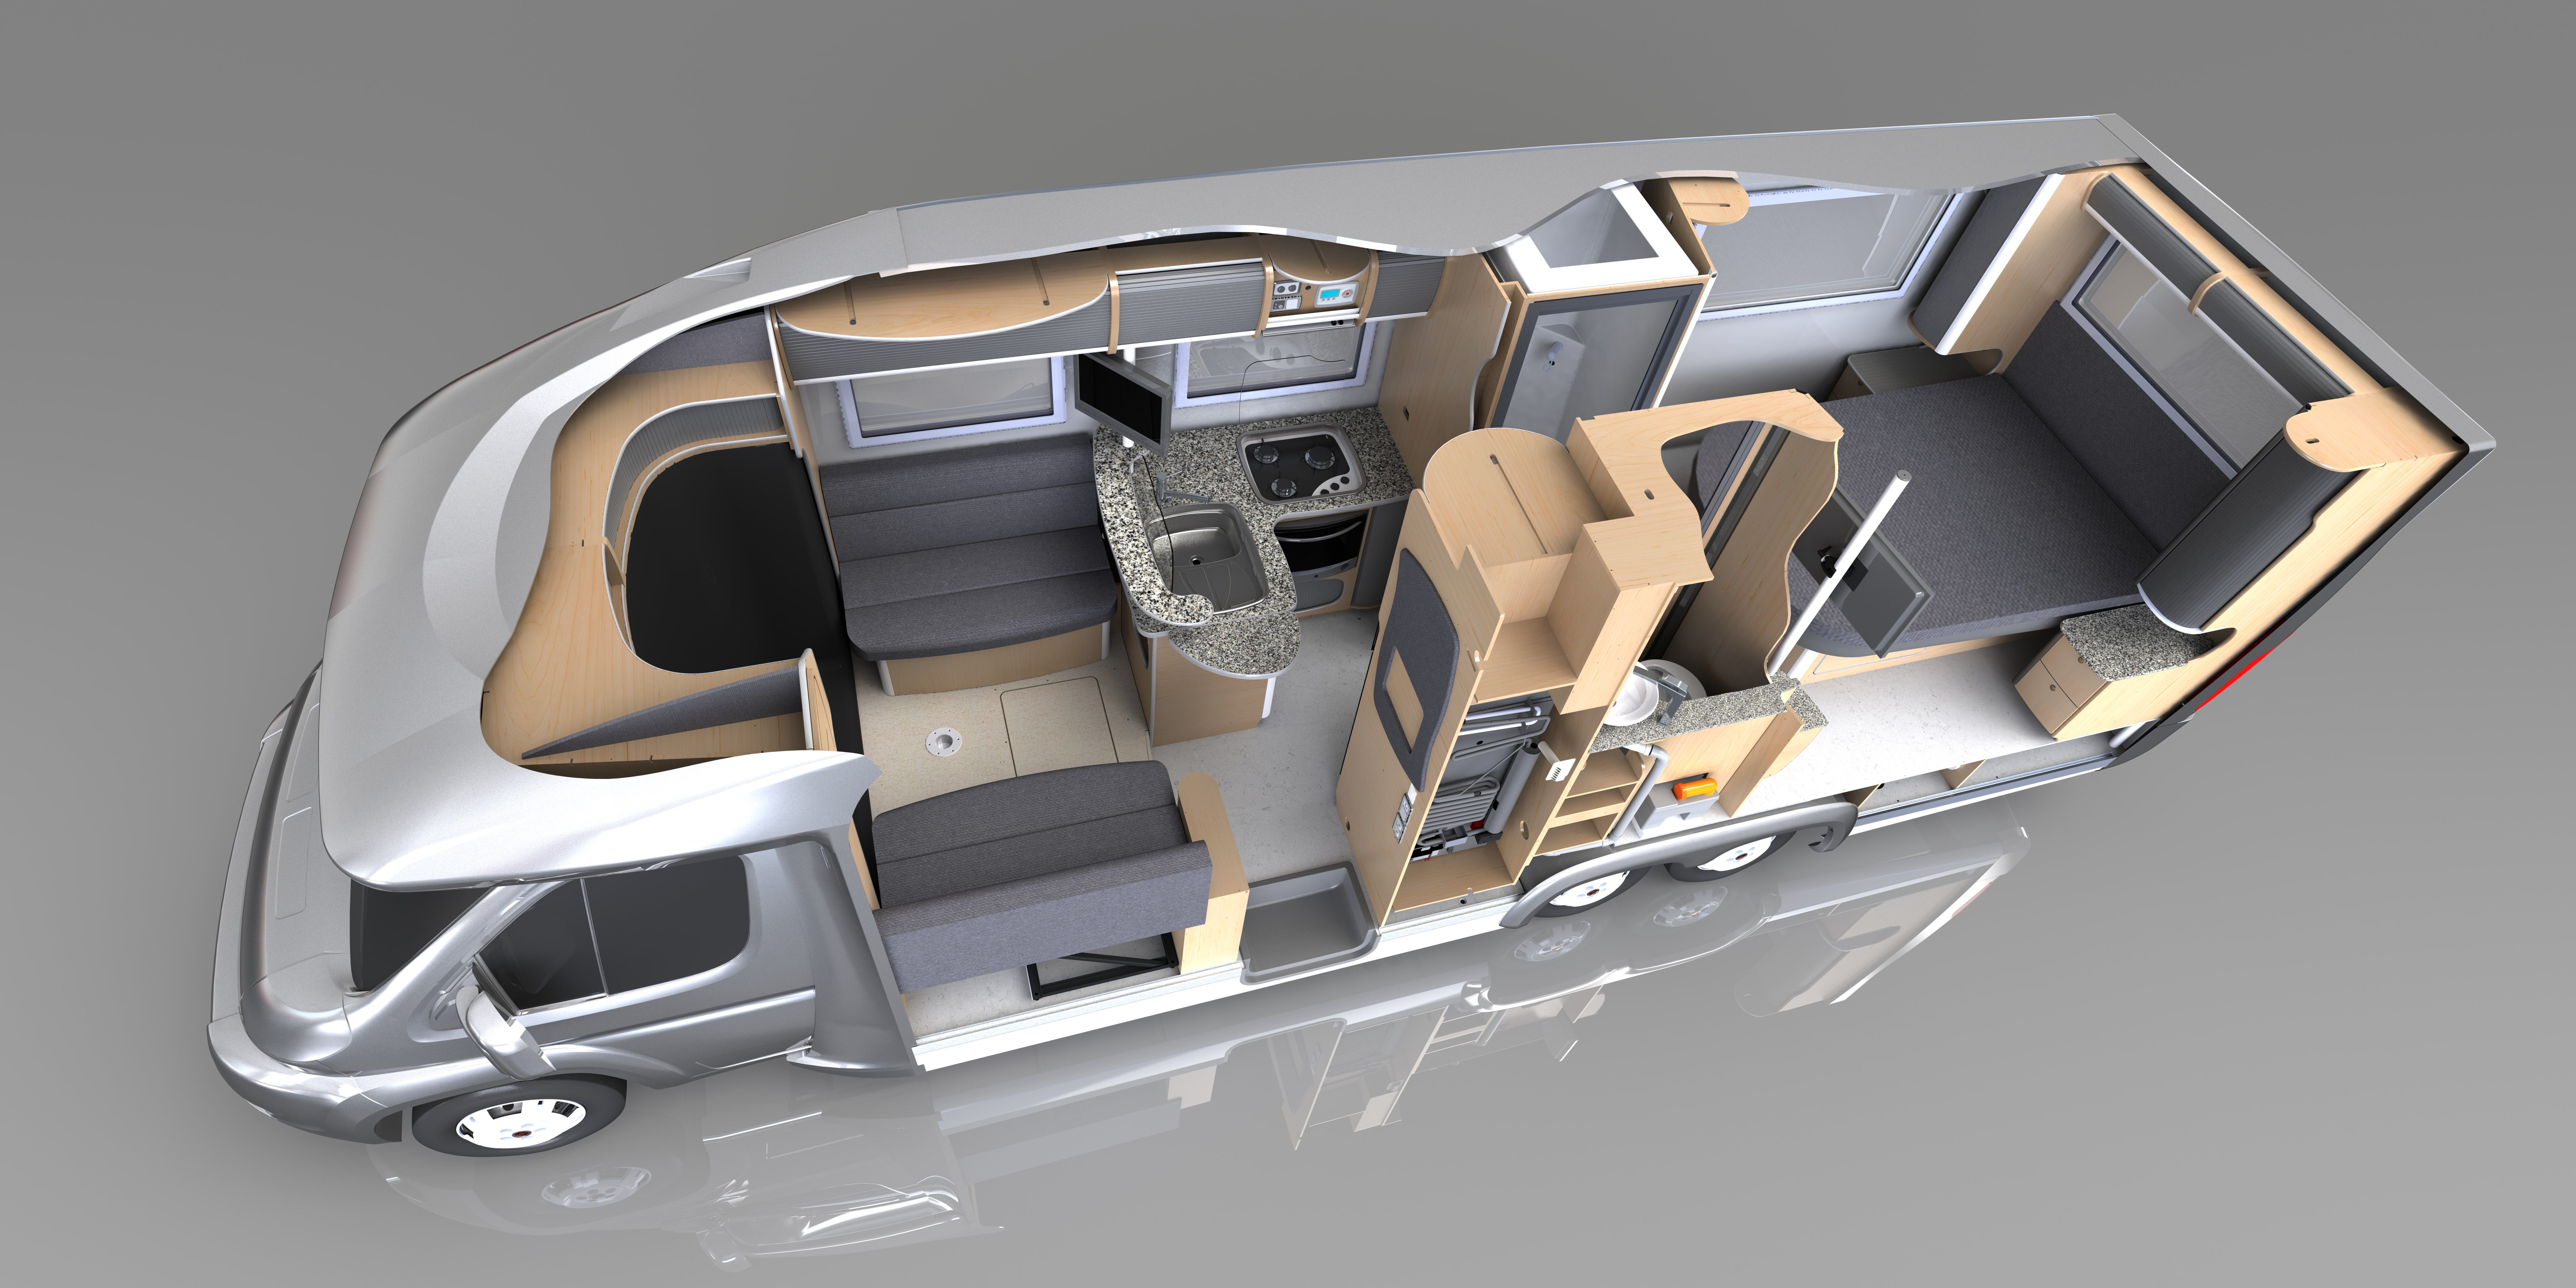 Mercedes Sprinter Motorhome Floor Plans Camp